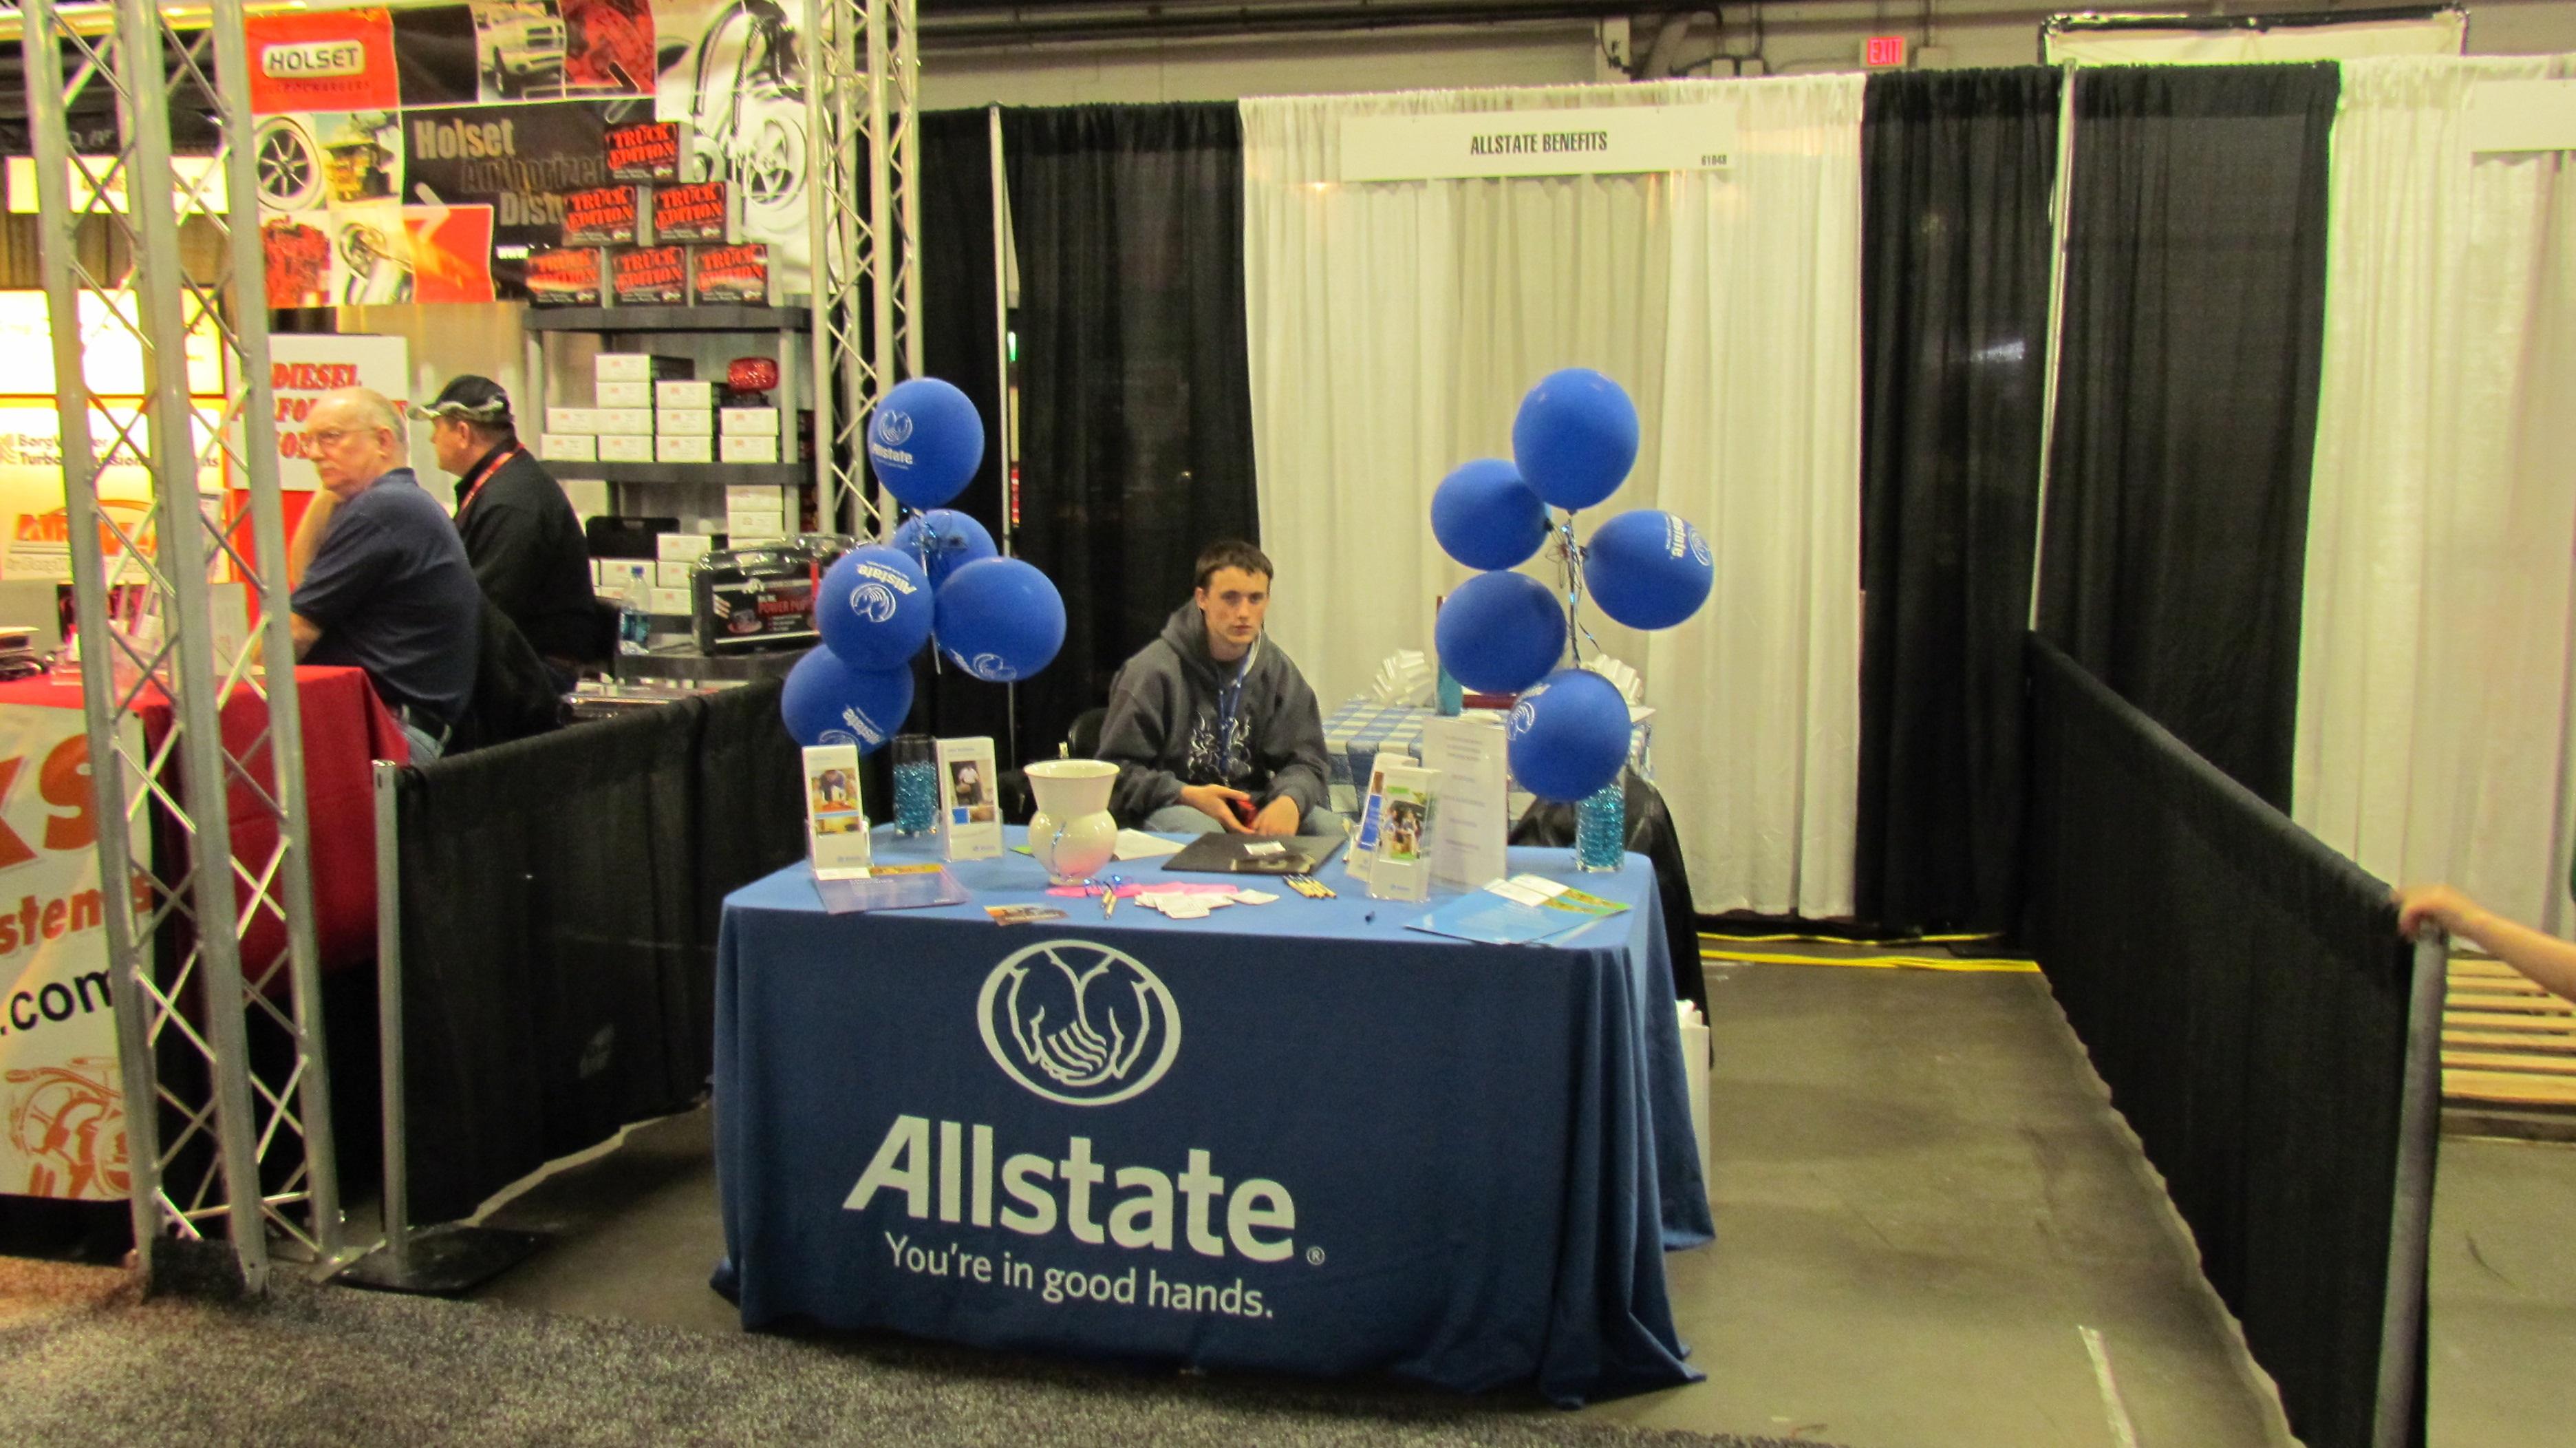 Bill Taylor: Allstate Insurance image 1